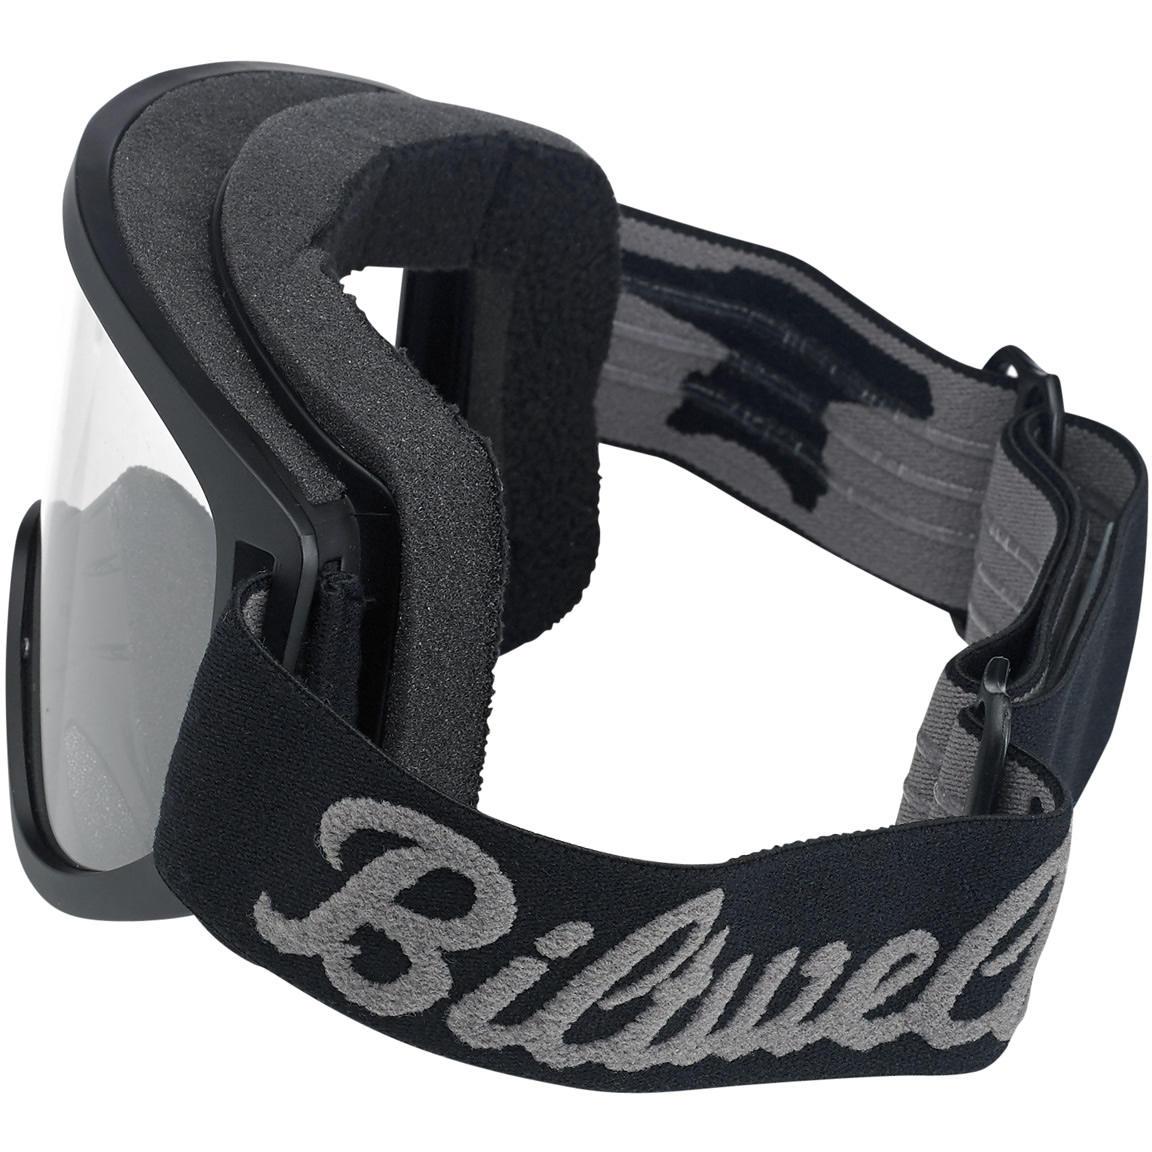 923d24e46cee Moto 2.0 Goggle – Black Script – Oldskool Trading Co